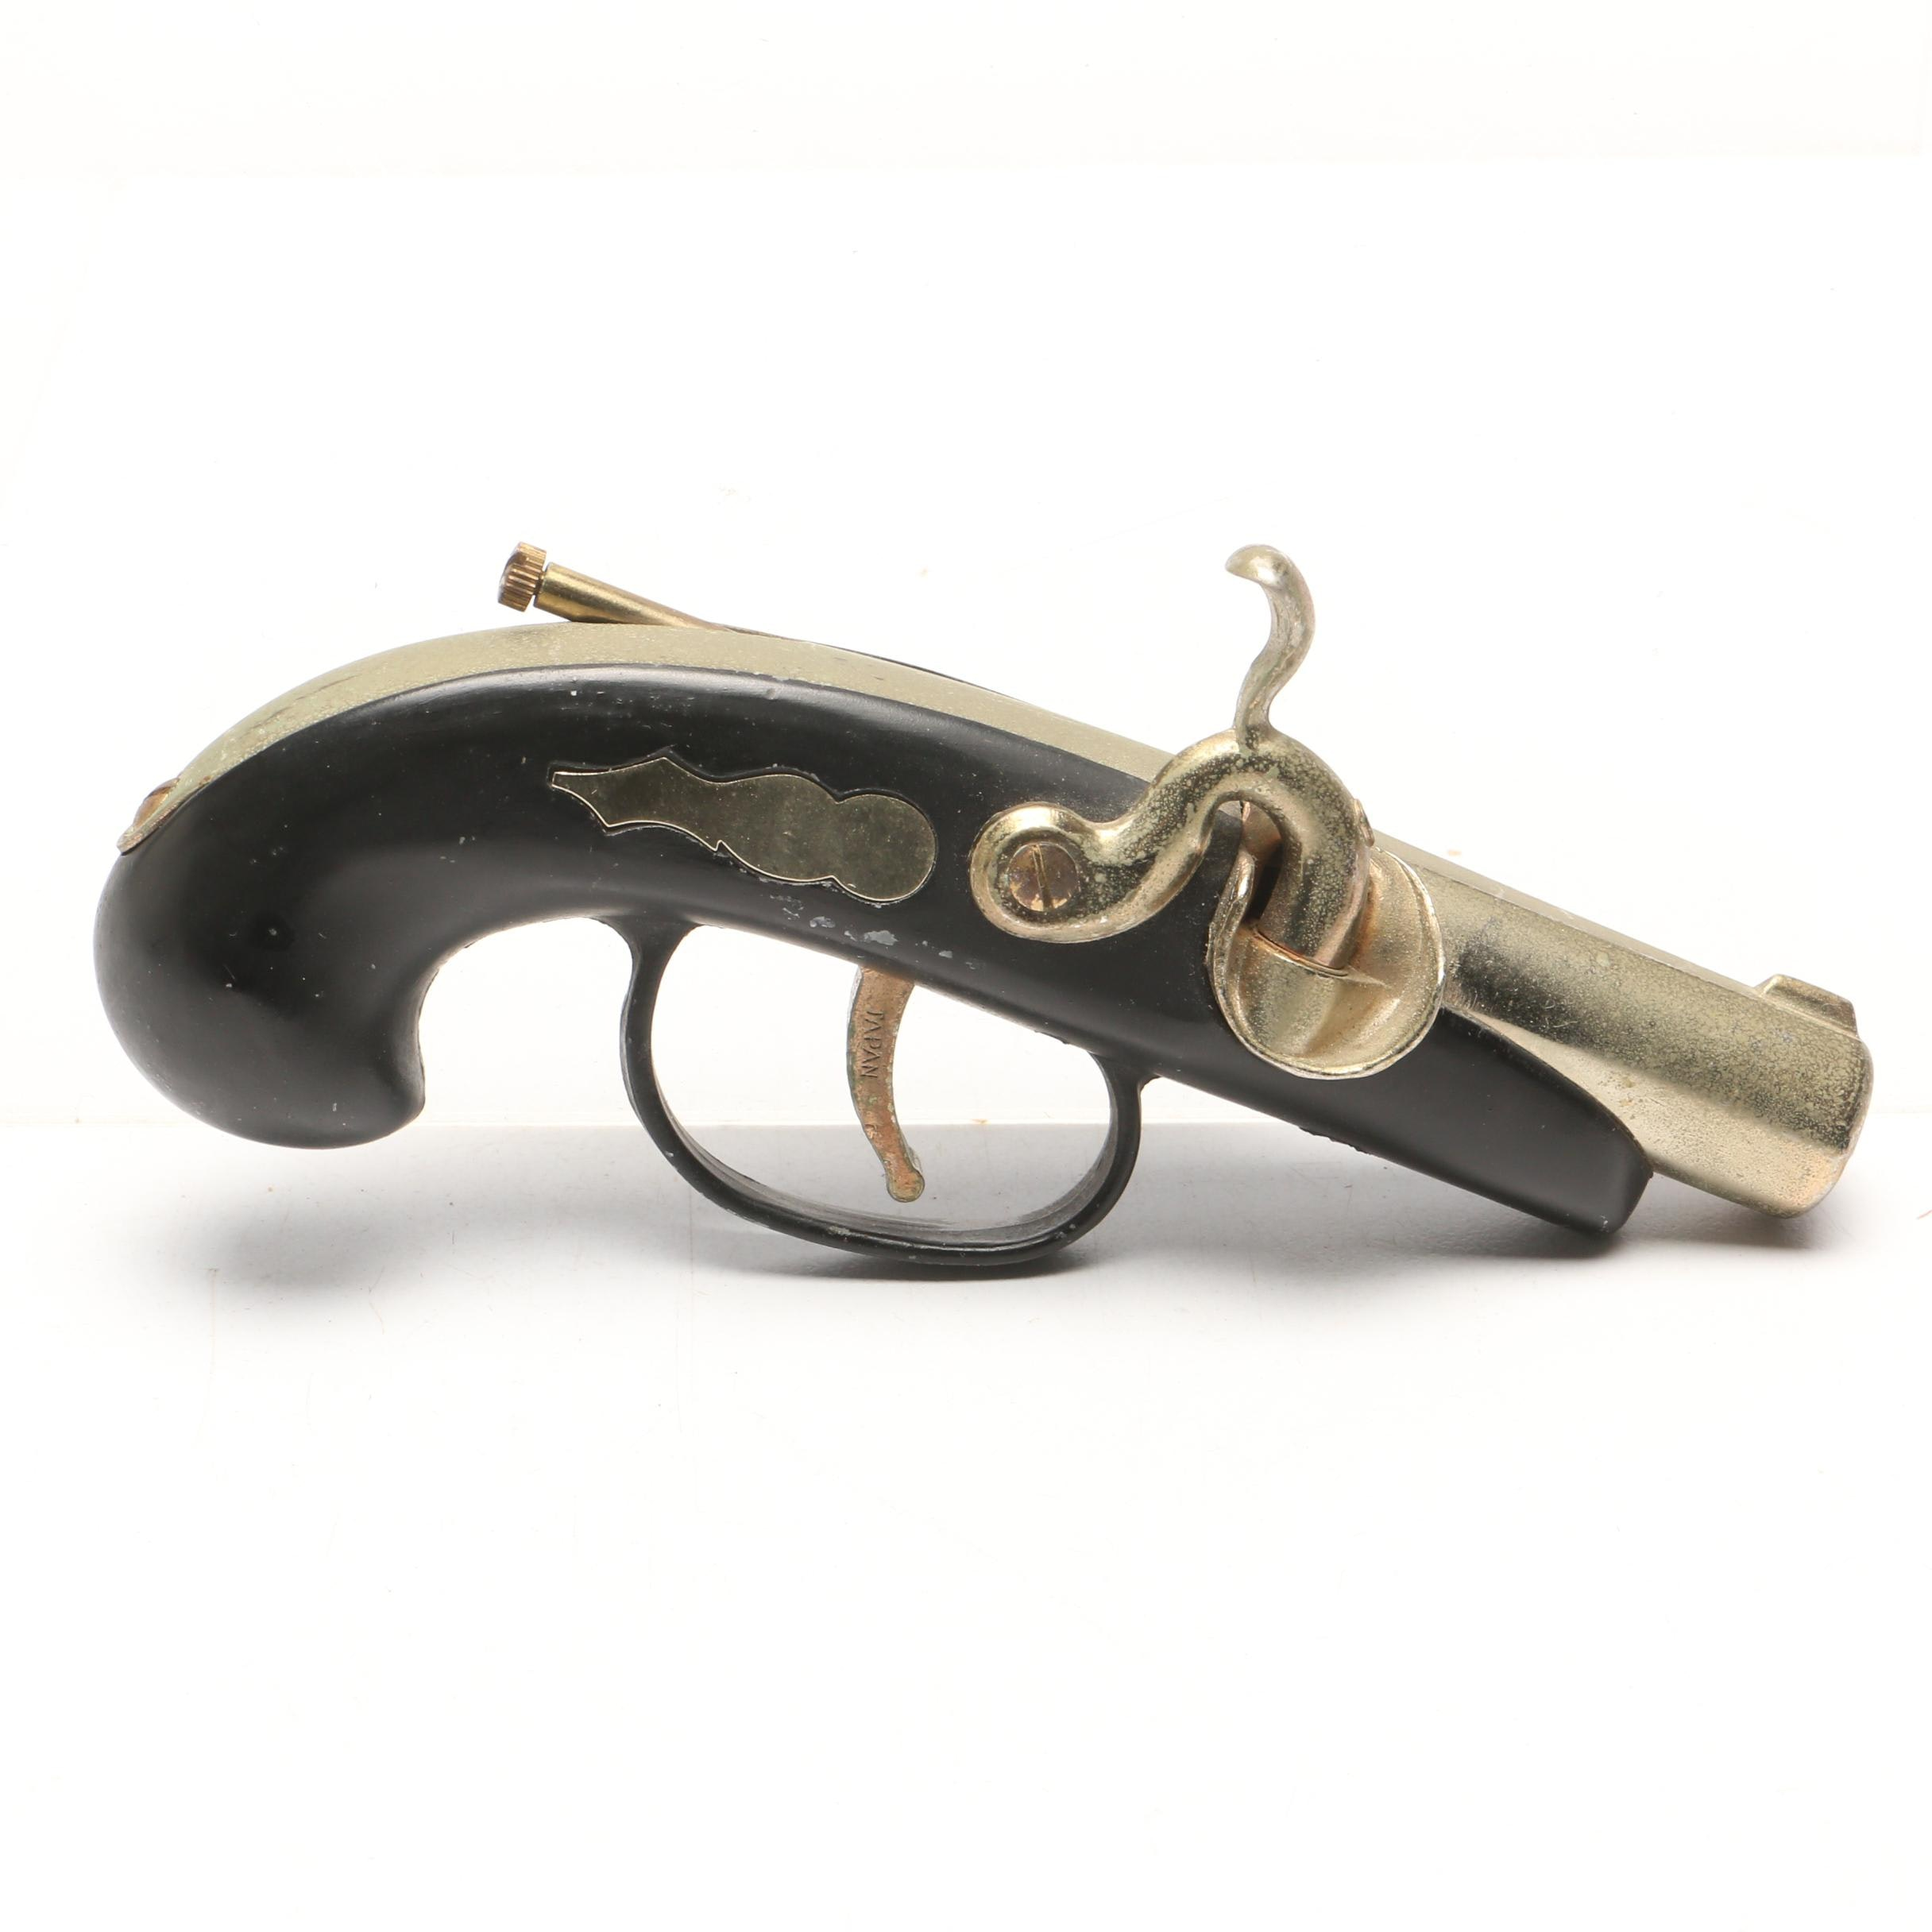 Cigarette Lighter as a Replica of a 19th-Century Era Black Powder Pistol